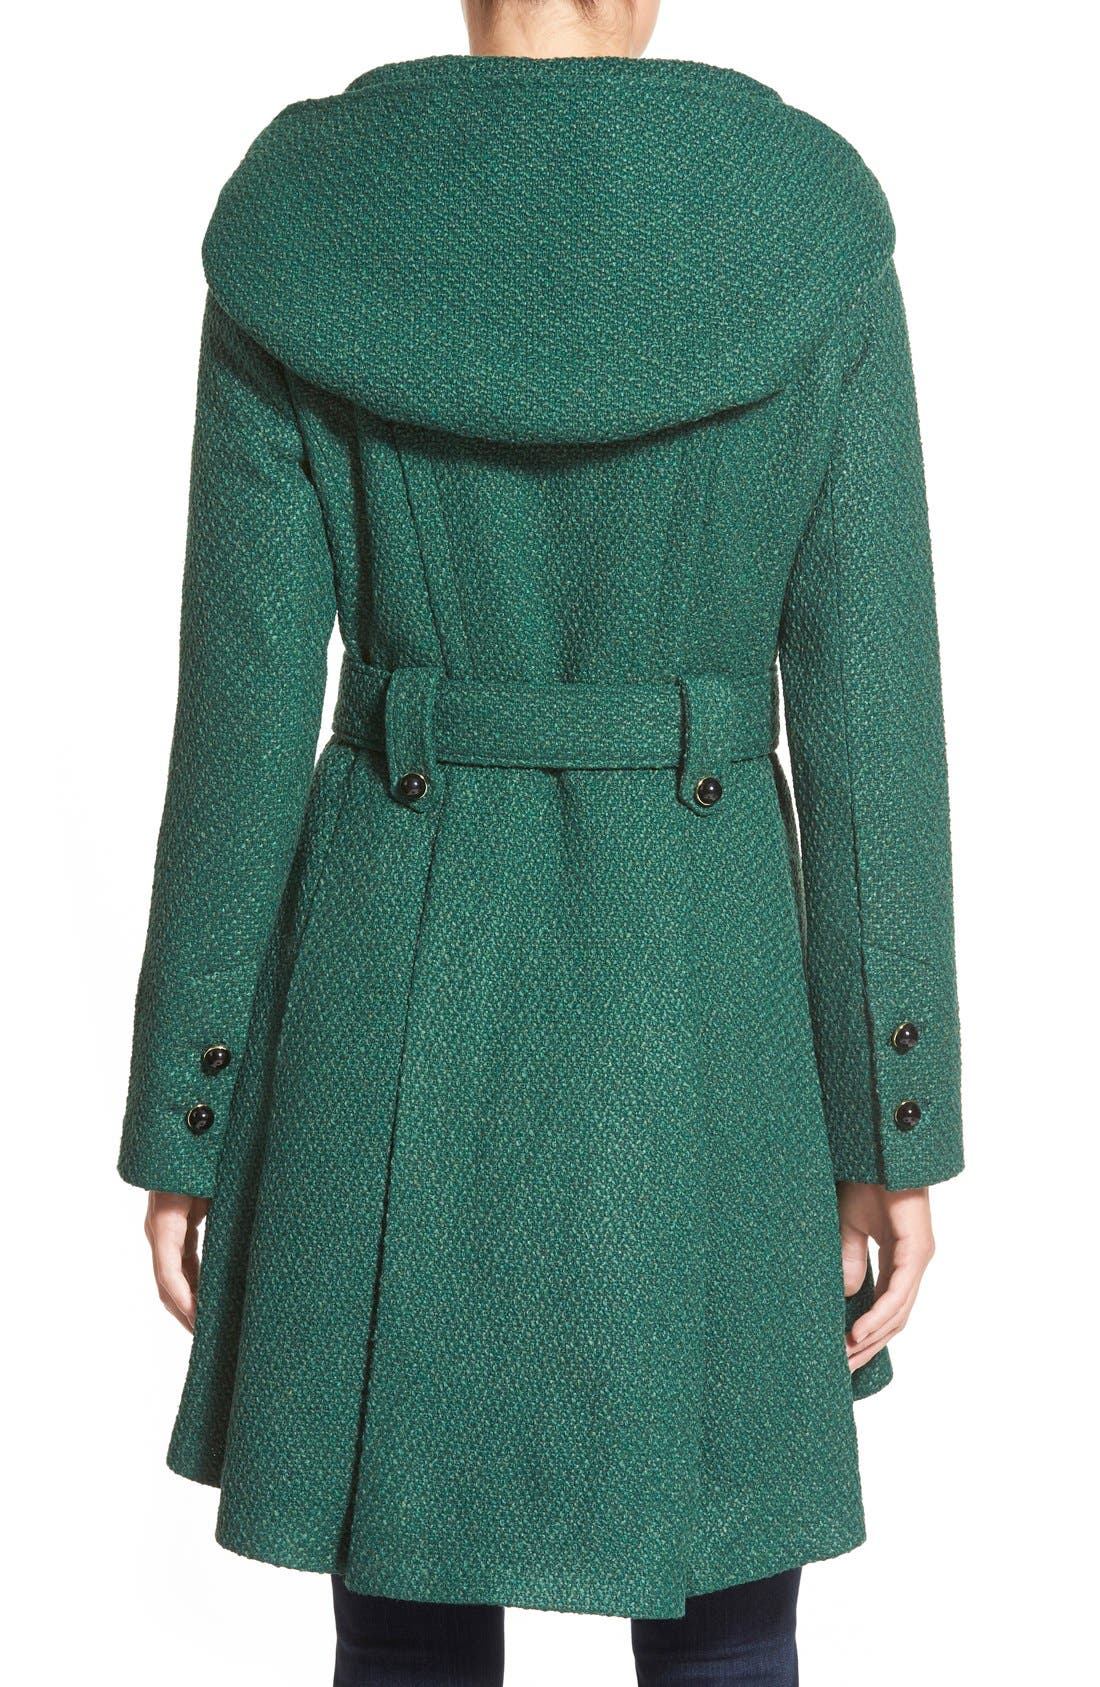 Belted Hooded Skirted Coat,                             Alternate thumbnail 31, color,